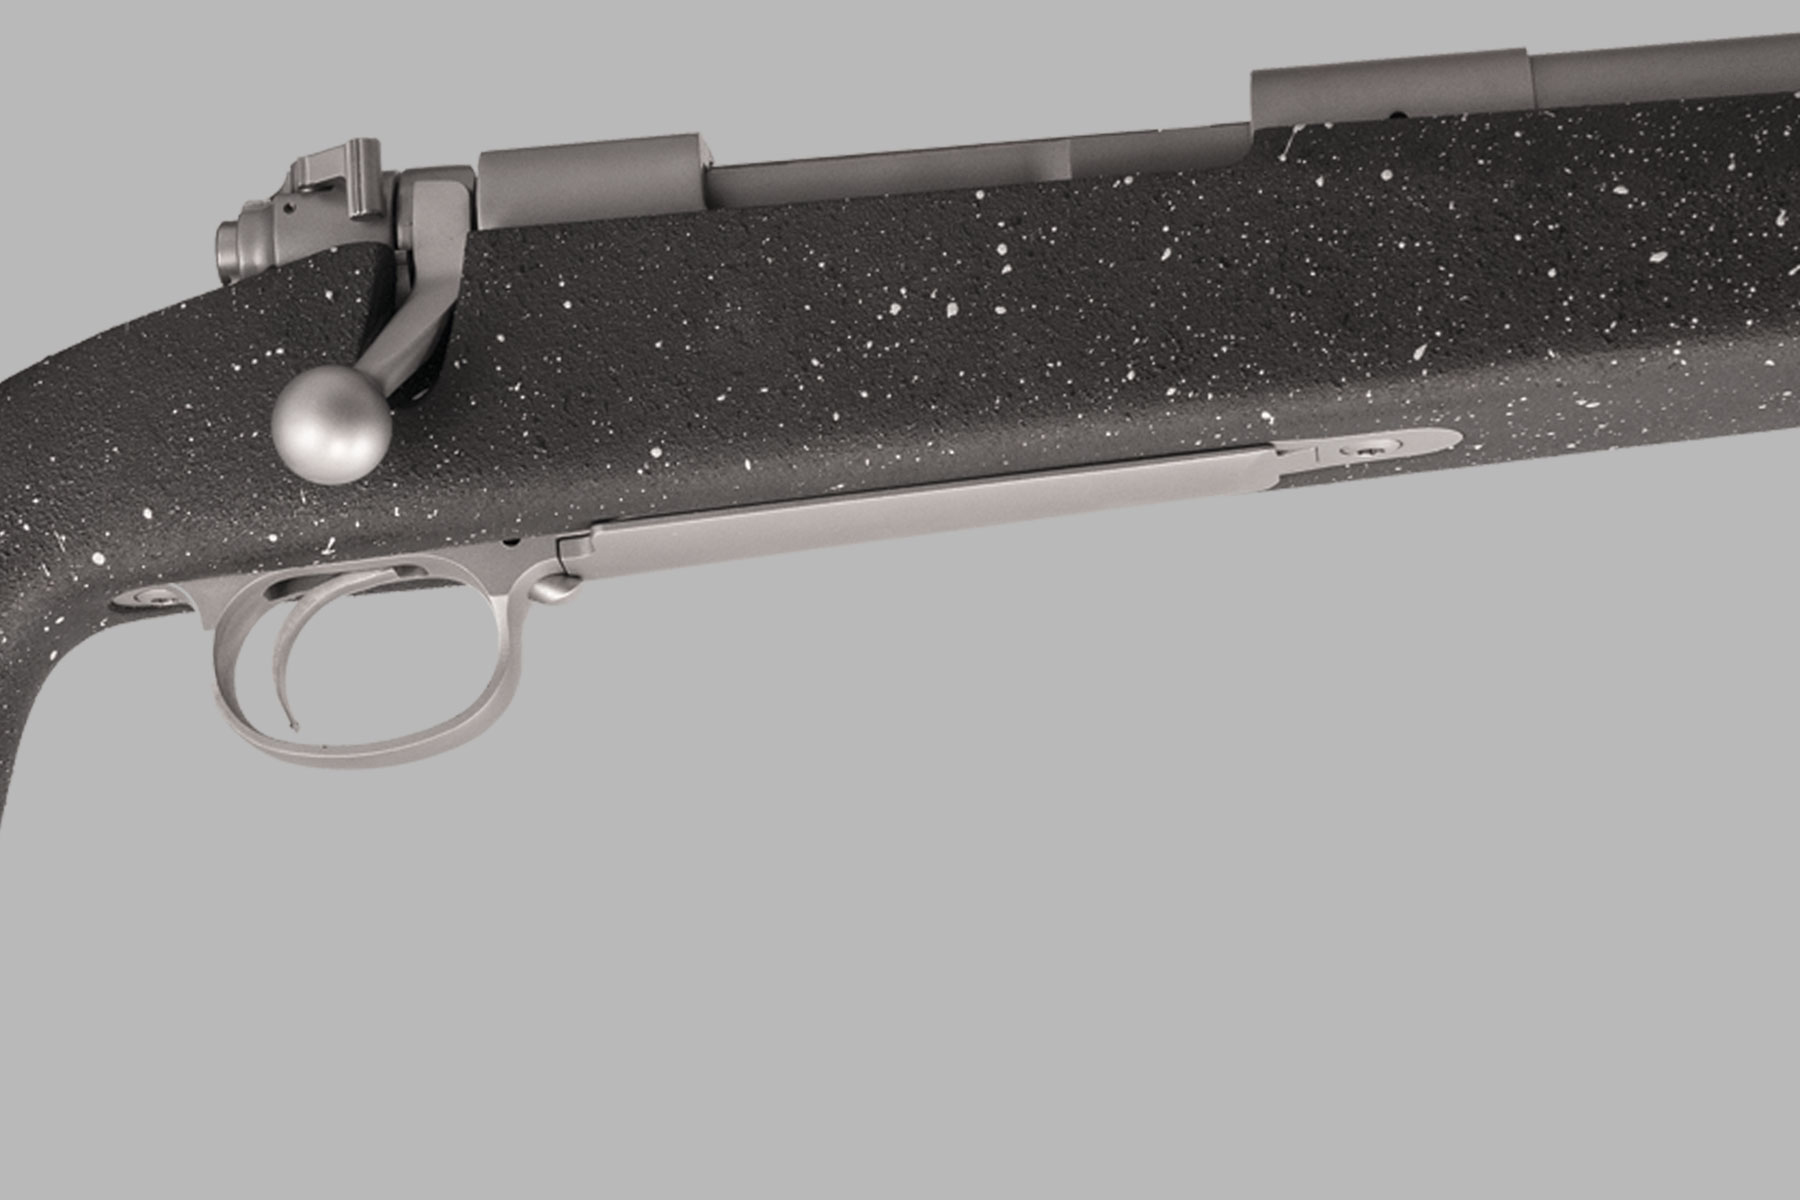 montana-rifle-02.jpg